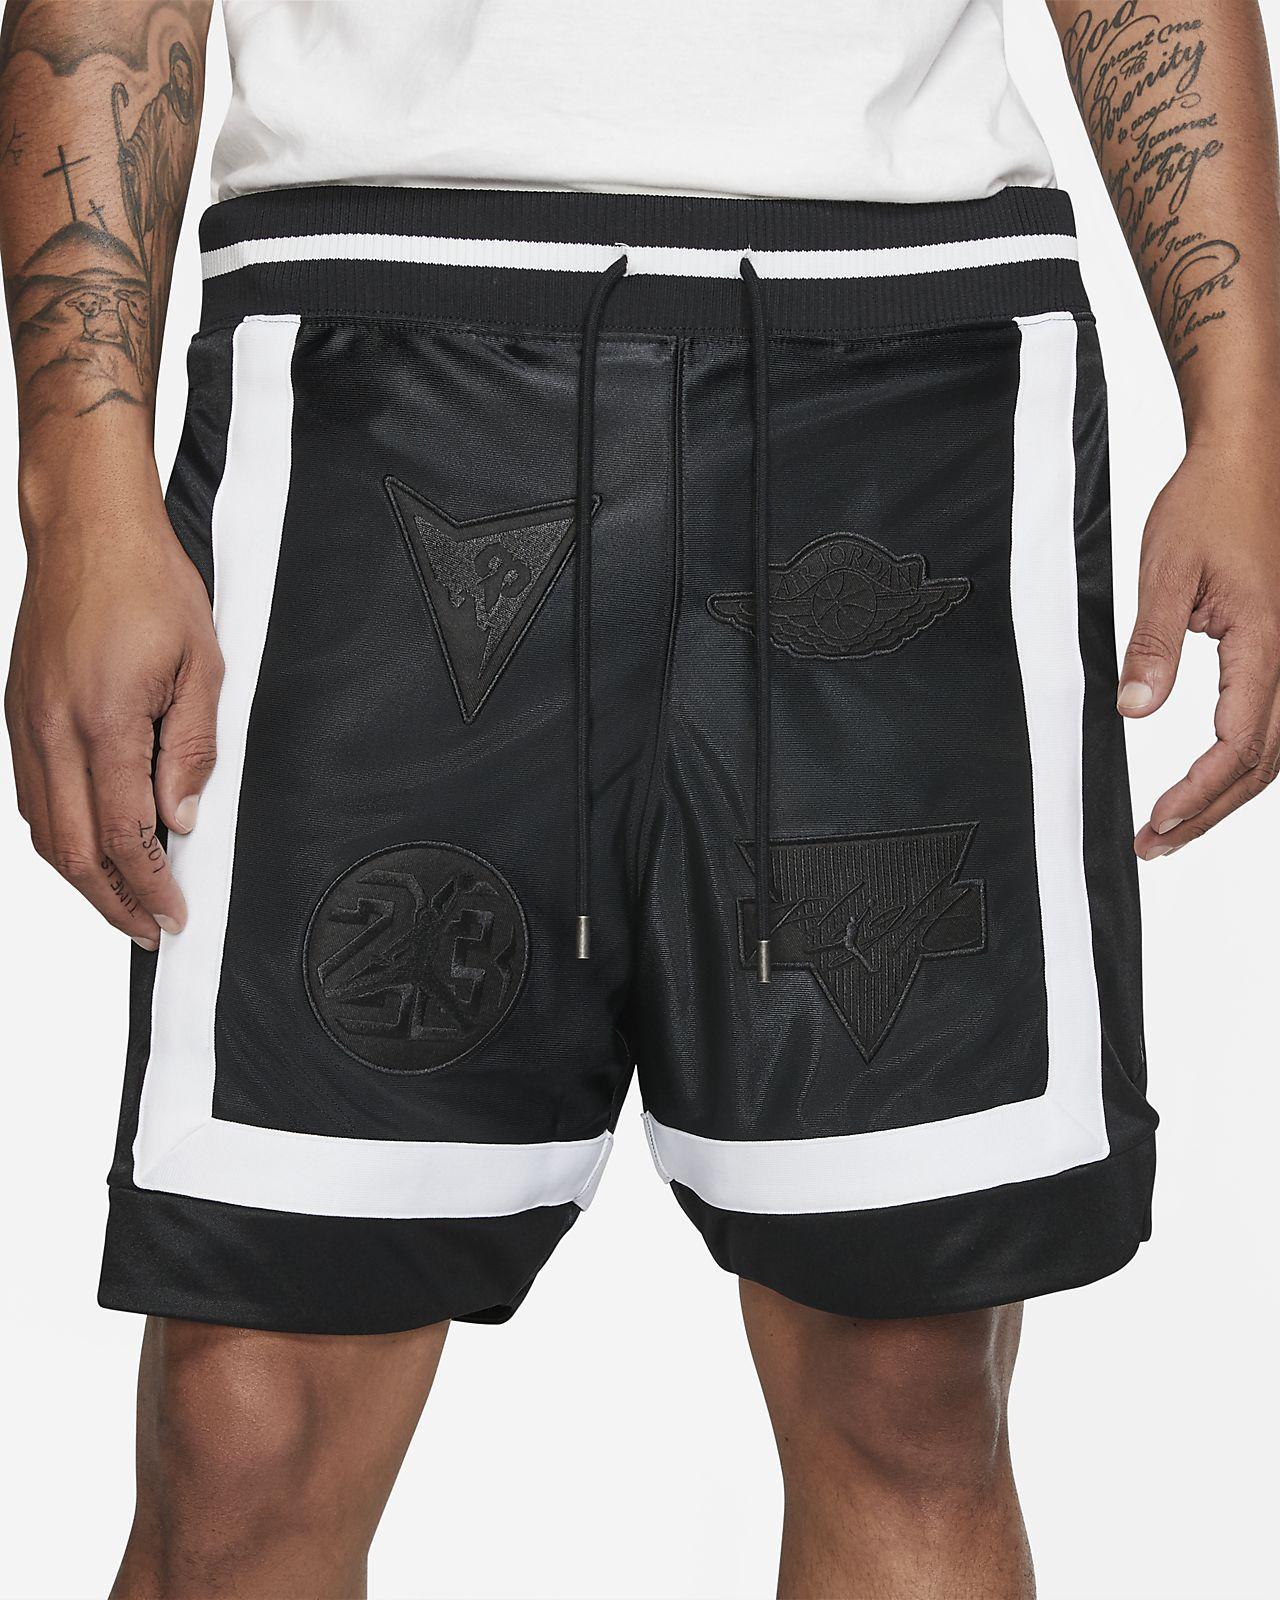 Jordan Sport DNA Diamond Men's Shorts